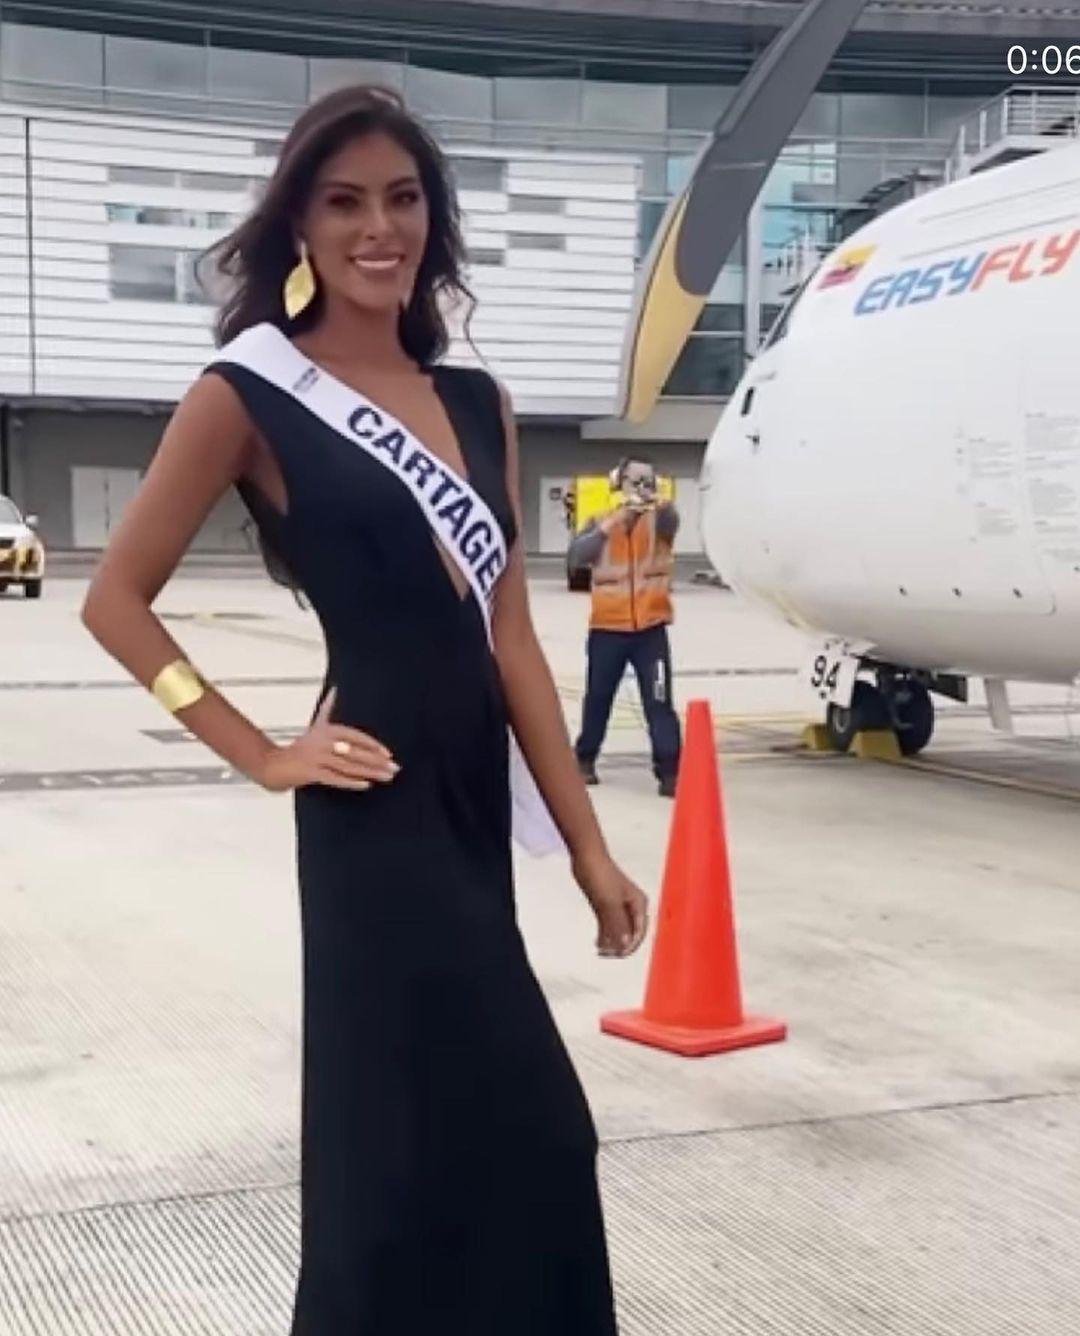 candidatas a miss universe colombia 2021. final: 18 oct. sede: neiva. - Página 4 52Swaj